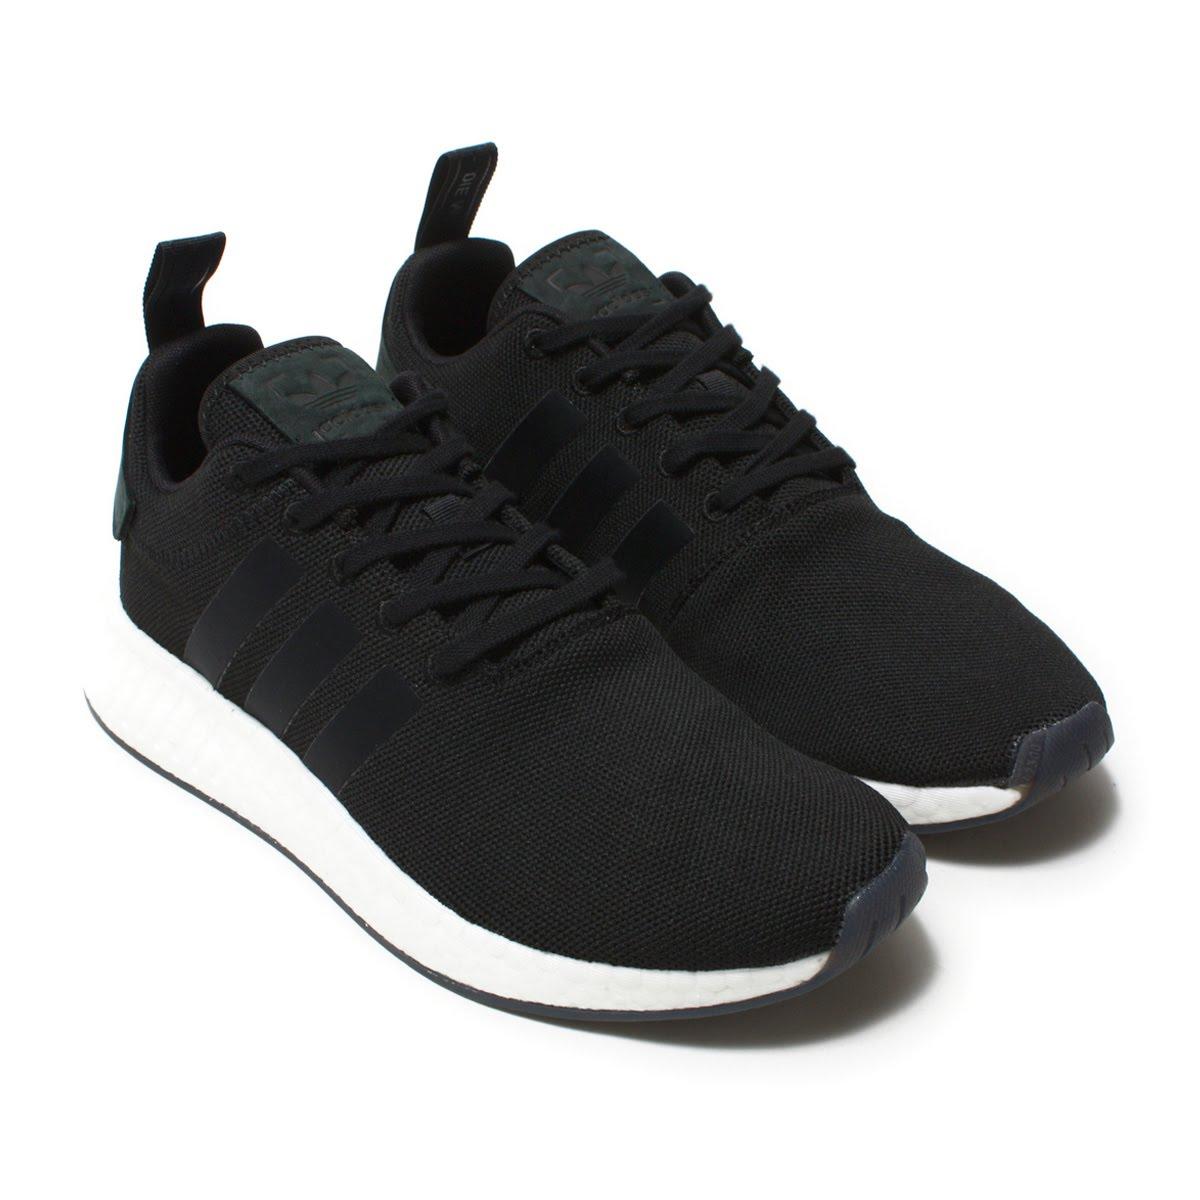 new styles d3e3f 2ed2f adidas Originals NMD_R2 (Adidas originals N M D R2) Core Black/Core  Black/Core Black 18SS-I